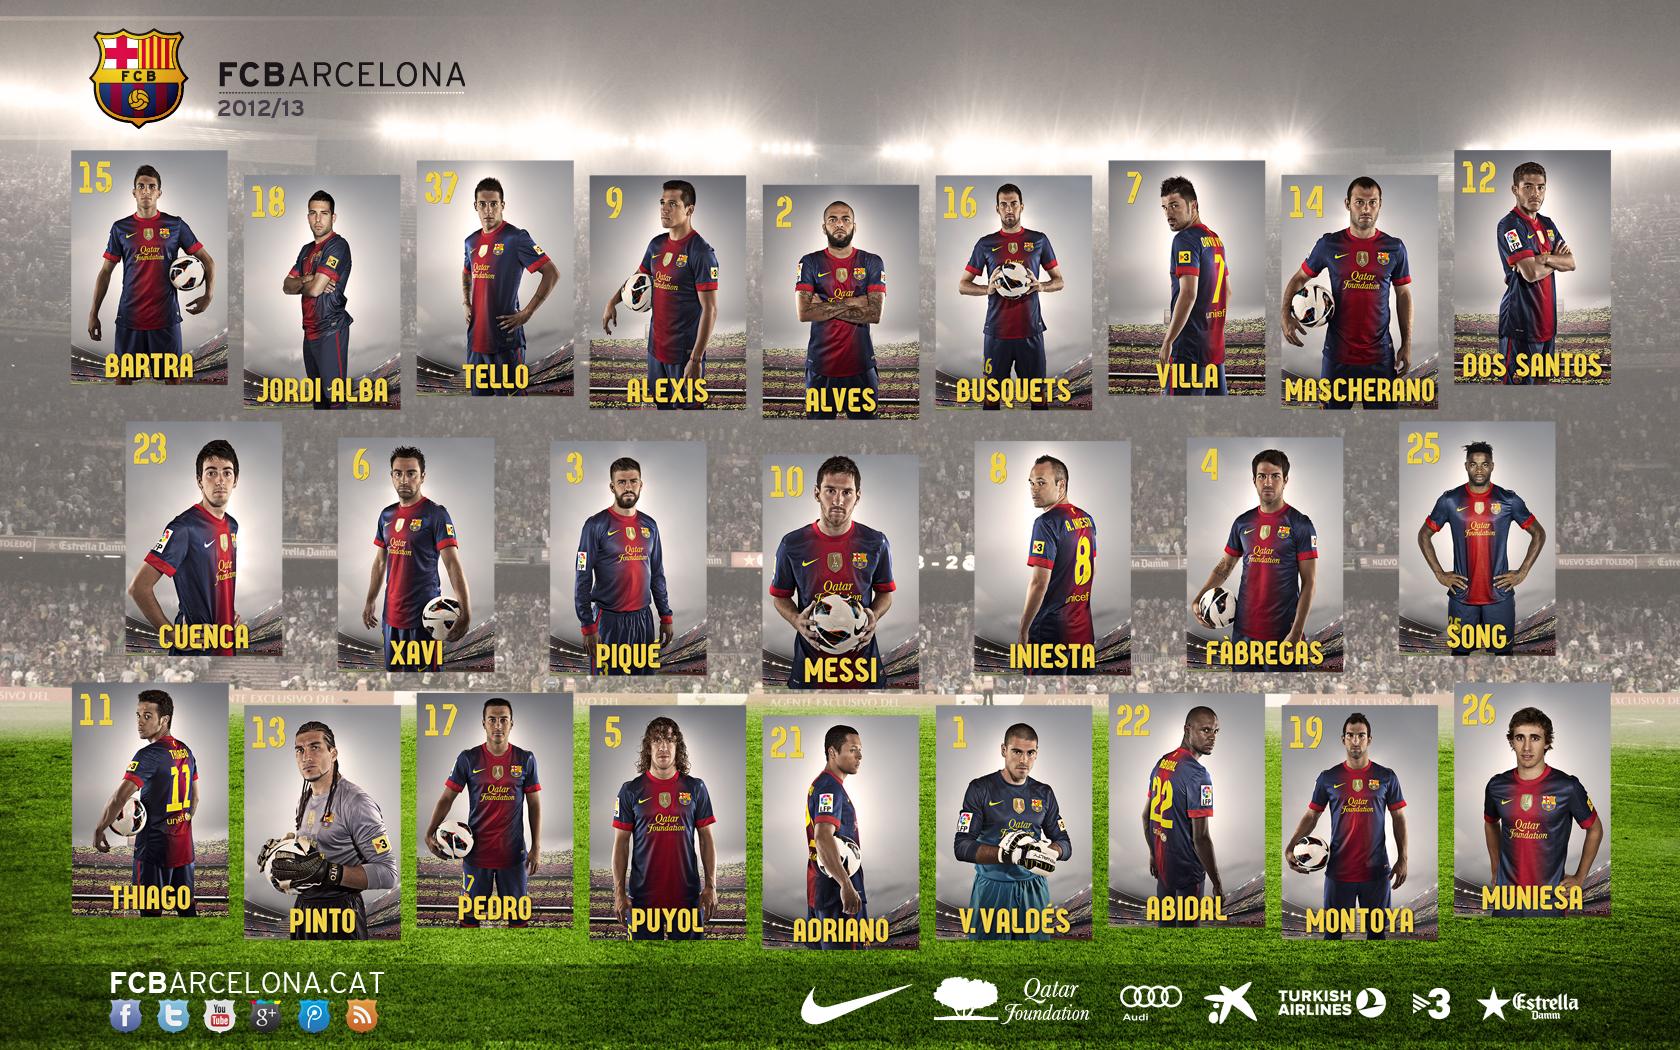 fc barcelona jugadors 2012 2013 voltagebd Choice Image